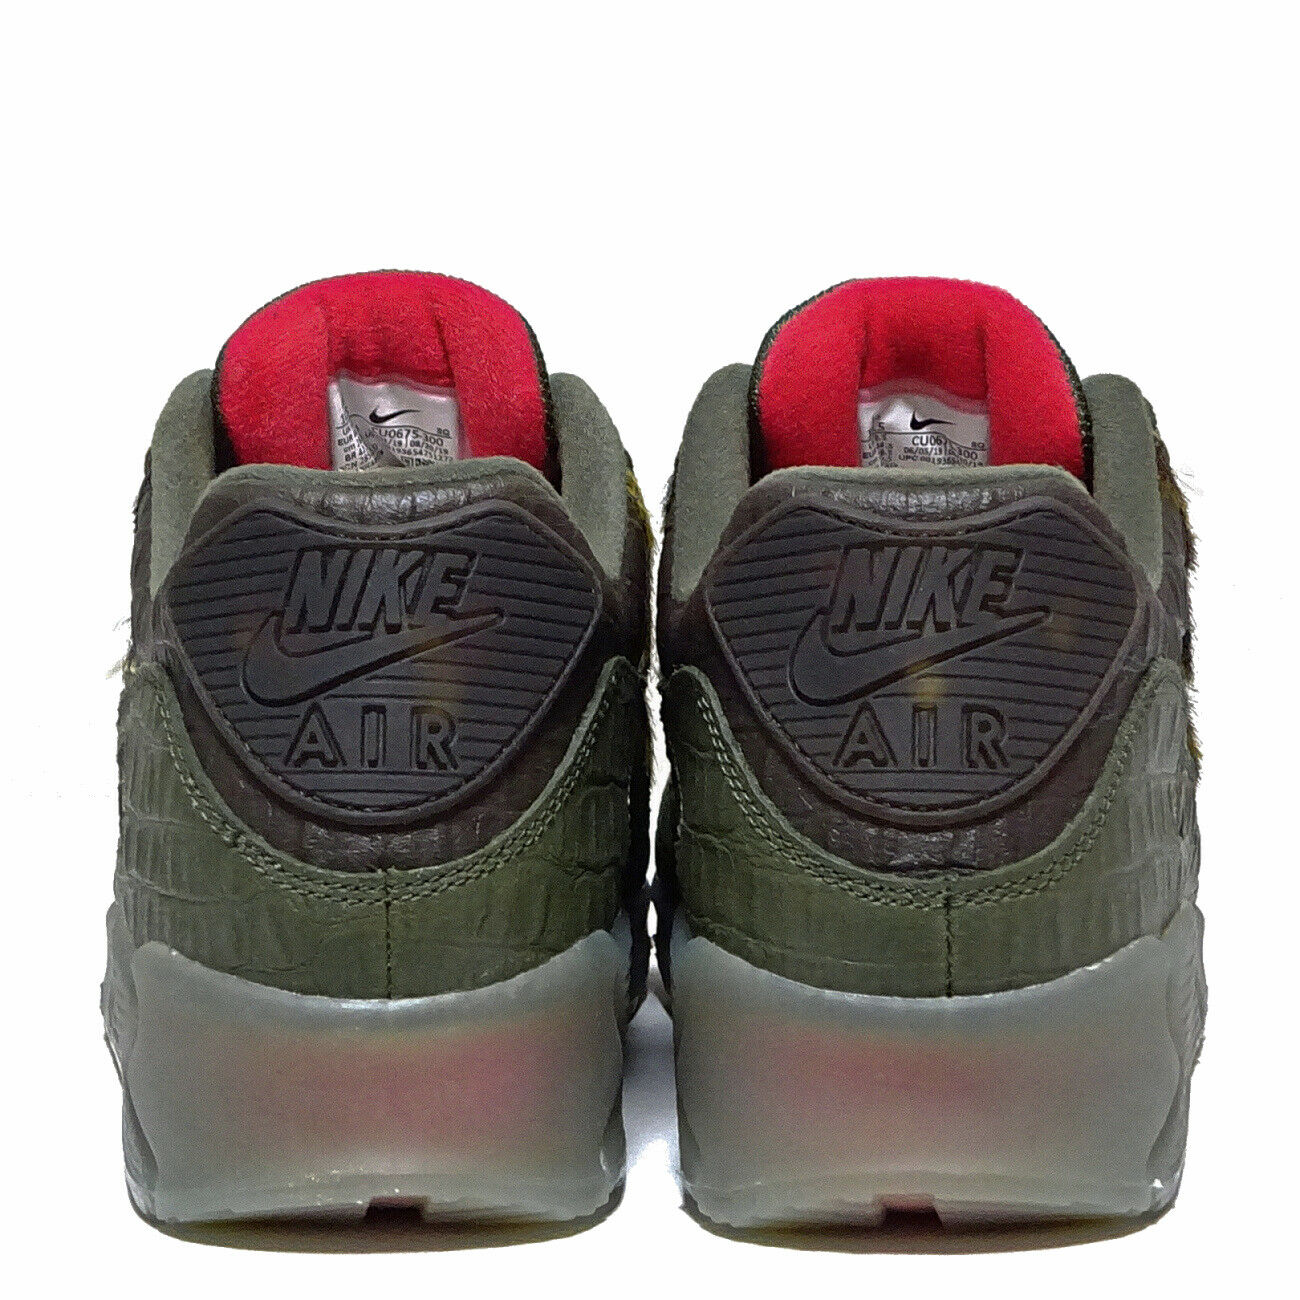 Size 10 - Nike Air Max 90 Crocodile Camo 2019 for sale online | eBay